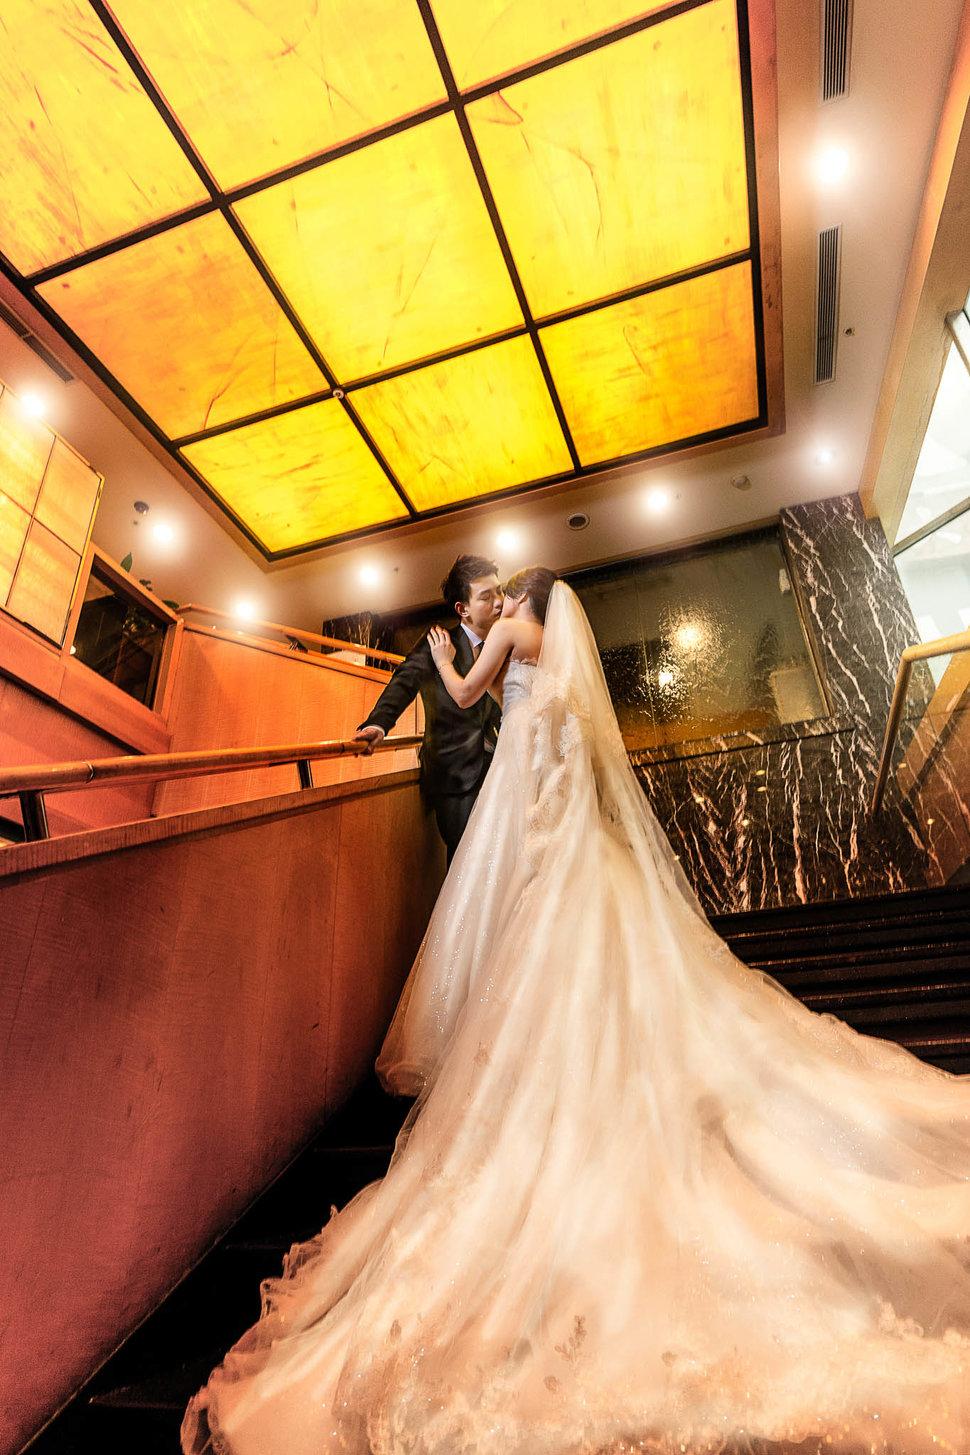 18PHOTO-元善❤️ 傳瑀(編號:308864) - 18PHOTO 婚紗影像攝影工作室 - 結婚吧